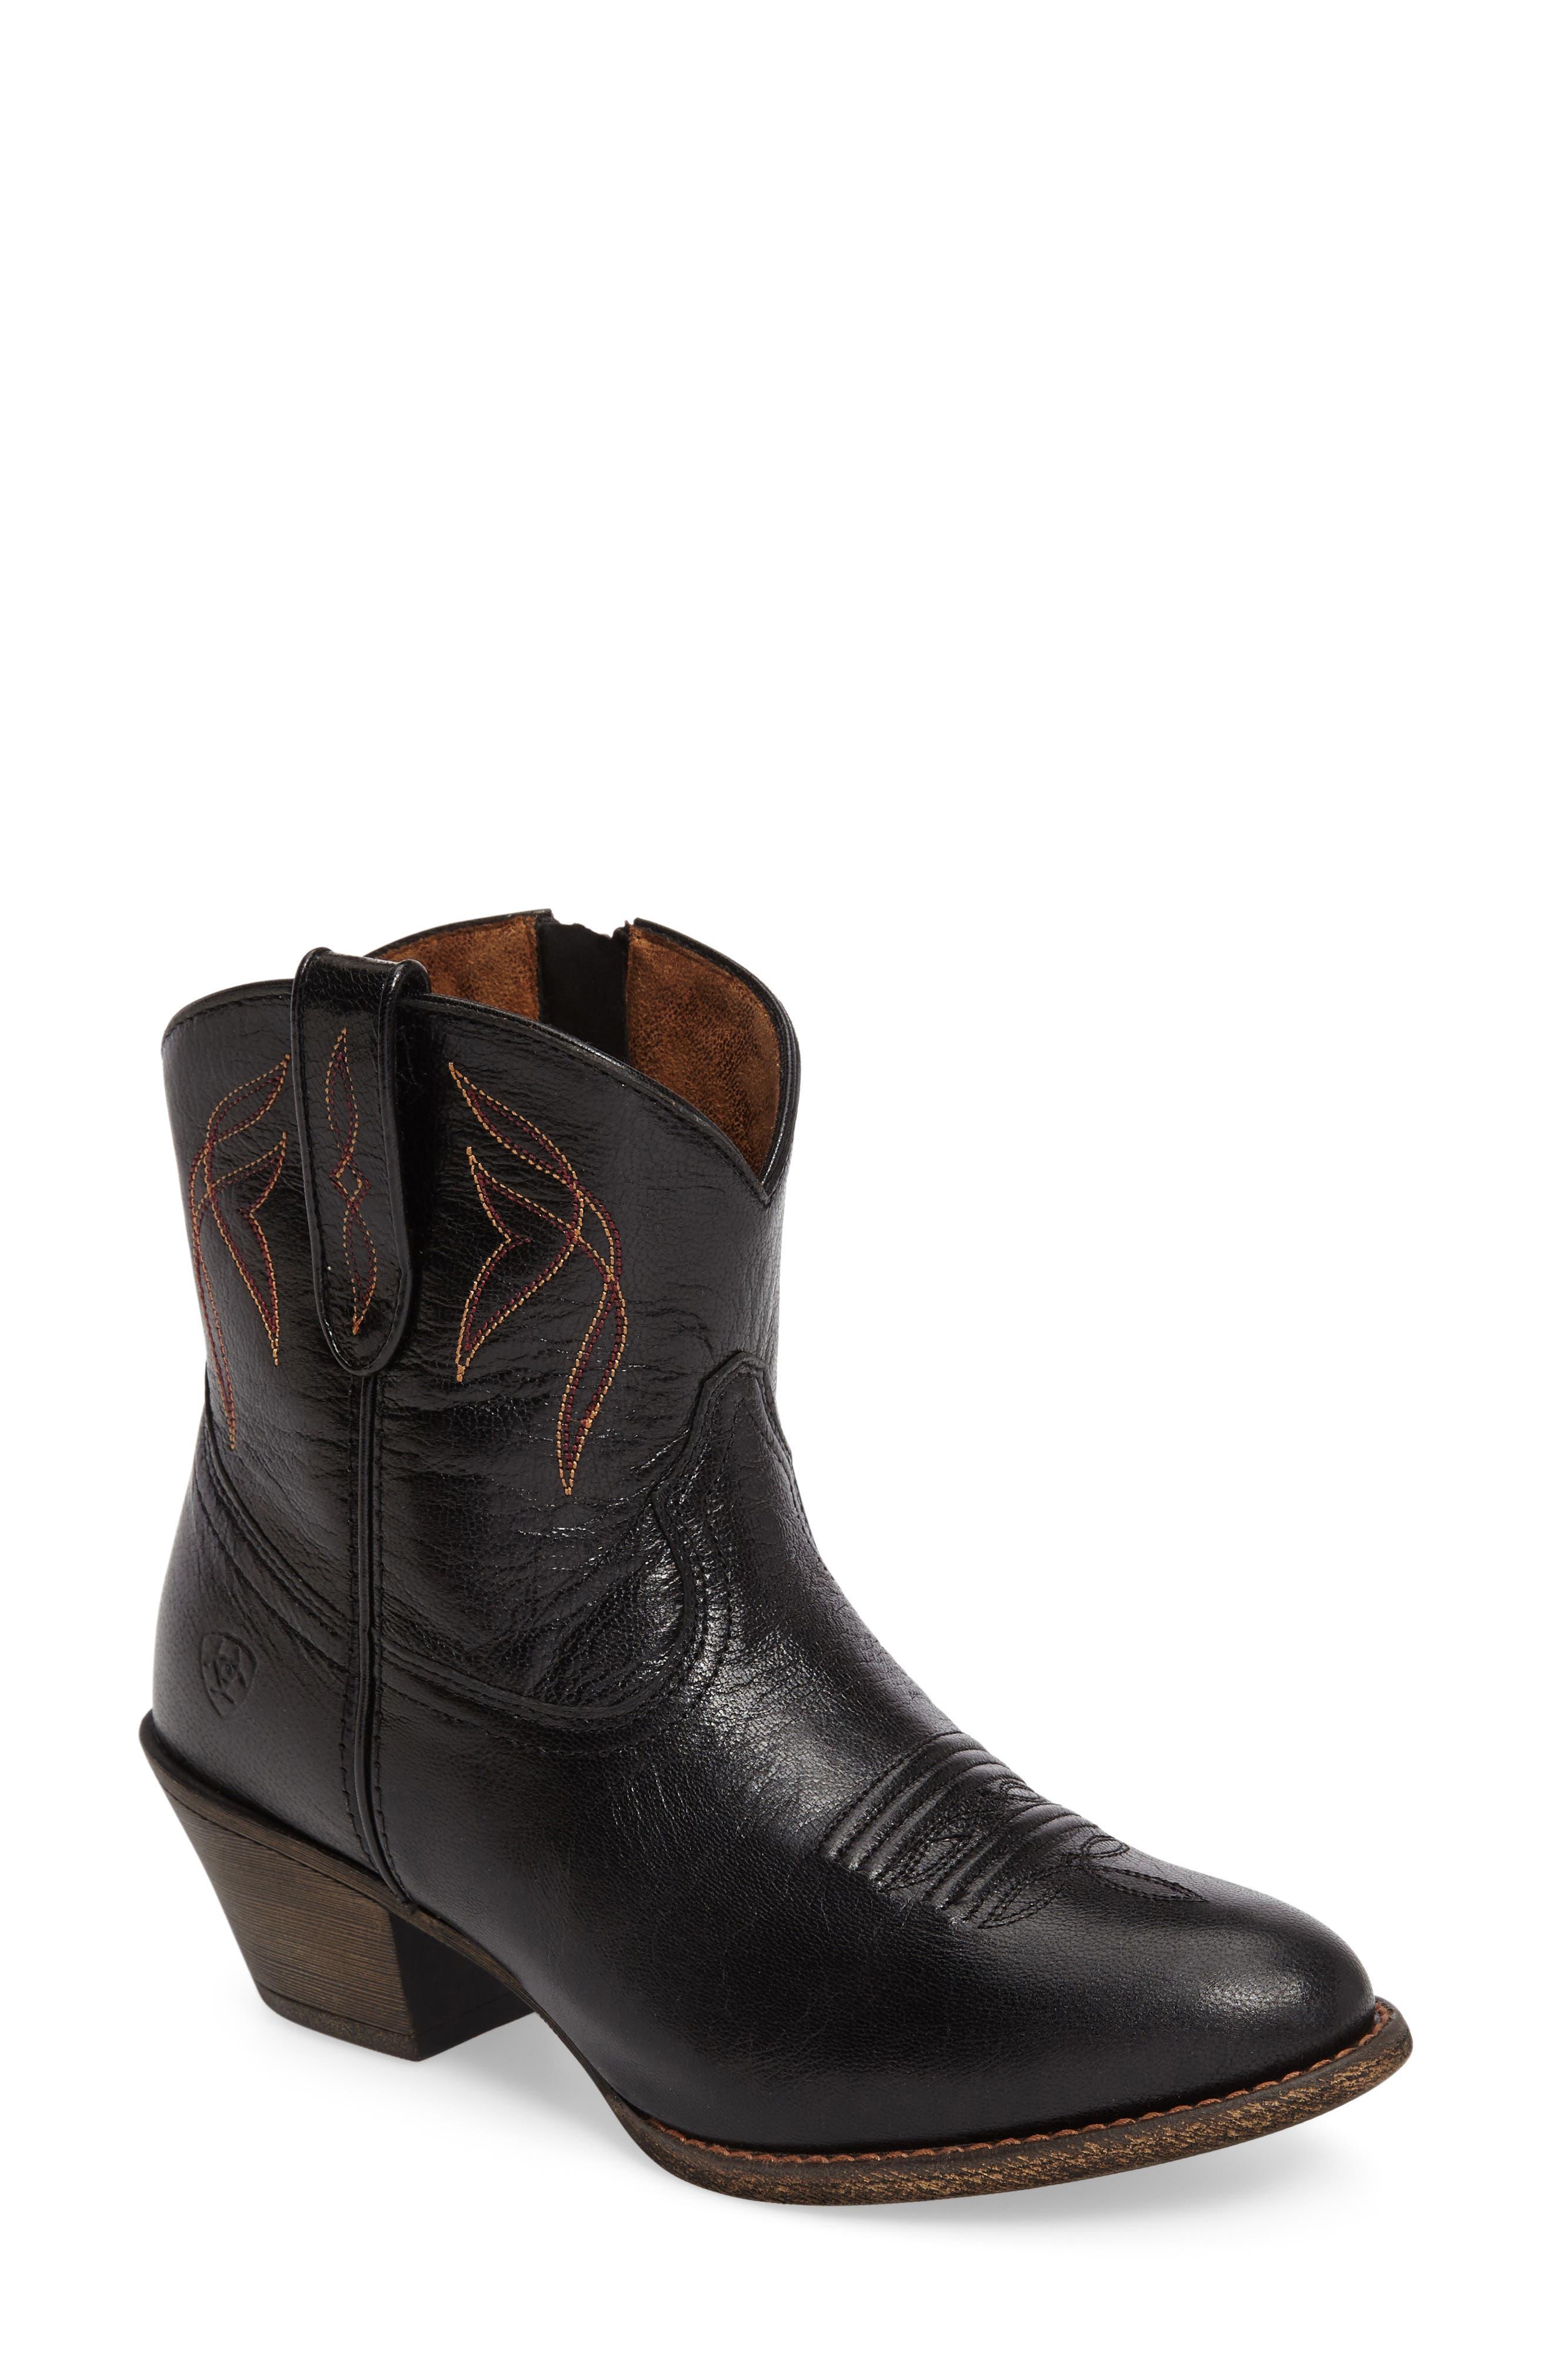 Ariat Darlin Short Western Boot- Black